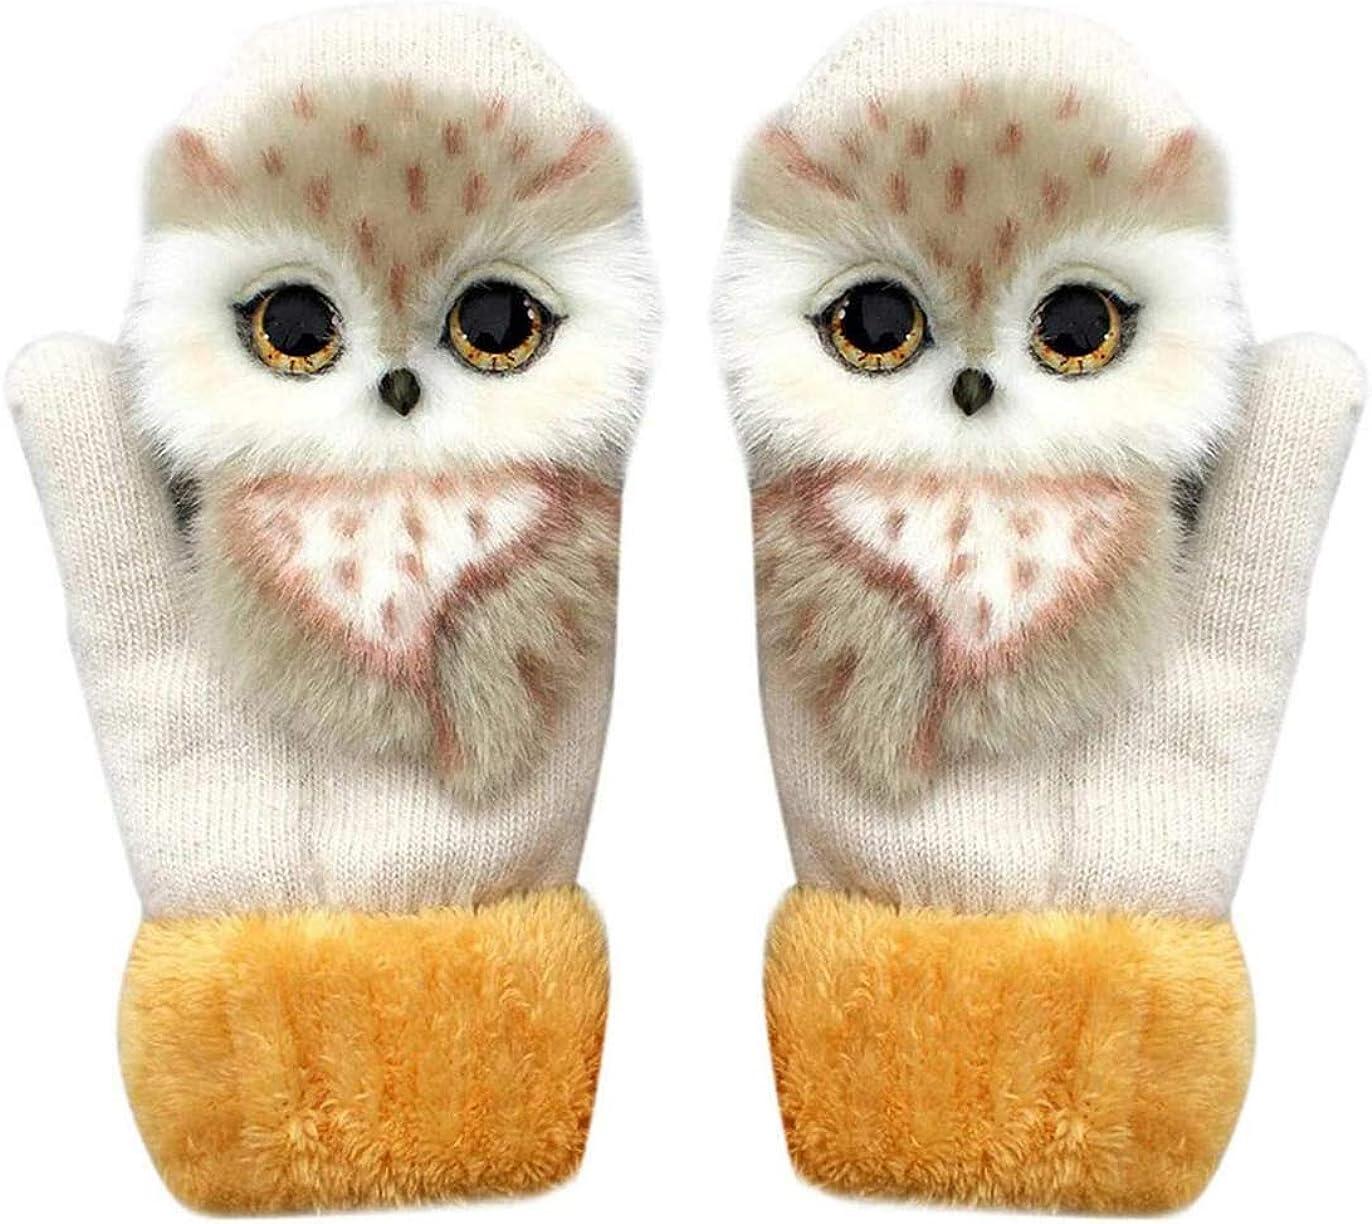 Dees Women's Soft Hand-knitted Gloves, Handmade 3D Cartoon Animal Gloves Hand Warmer Mitten Gloves for Xmas Gifts.